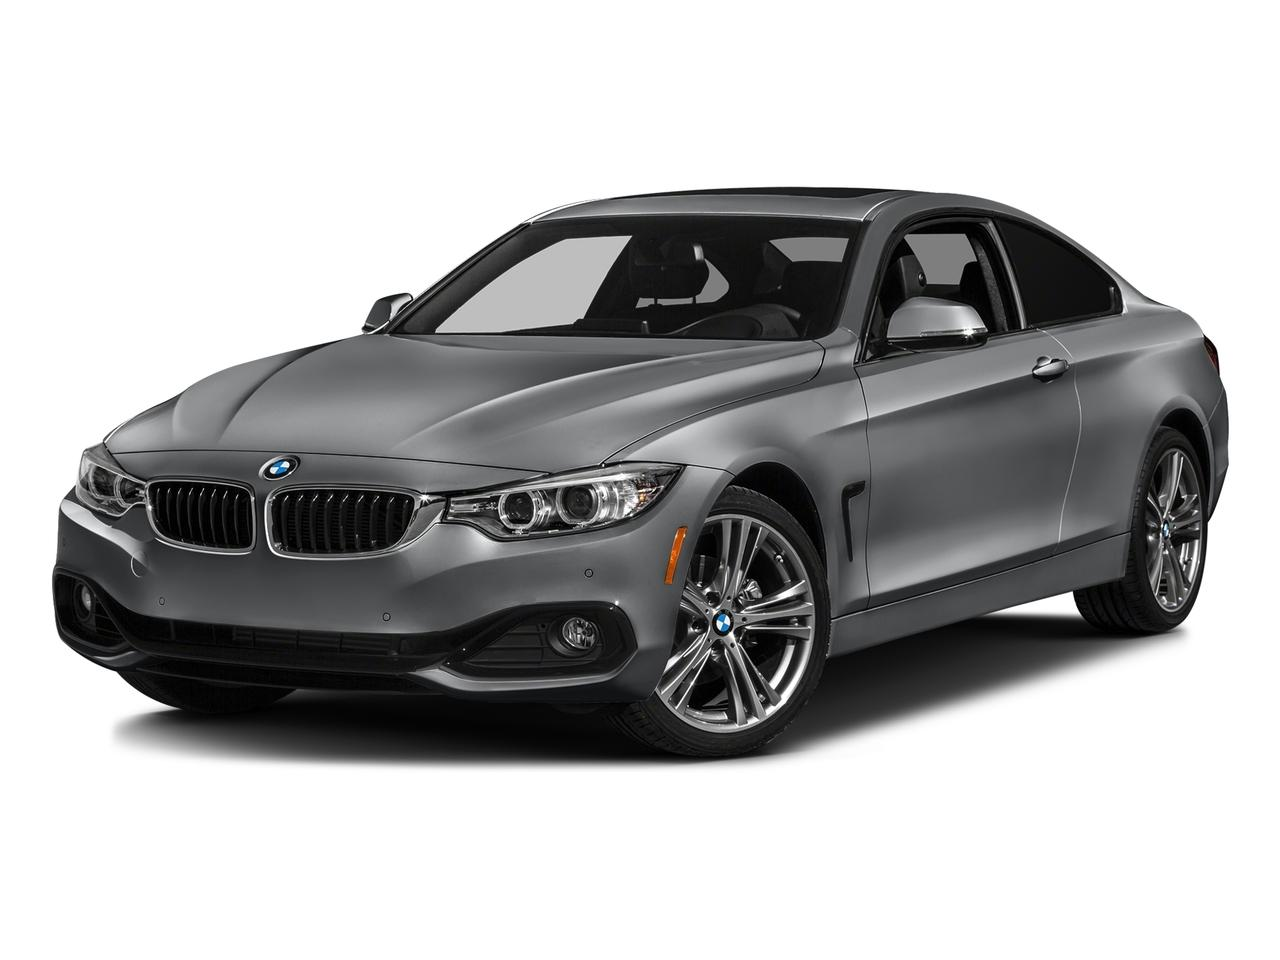 2017 BMW 430i Vehicle Photo in Tulsa, OK 74133